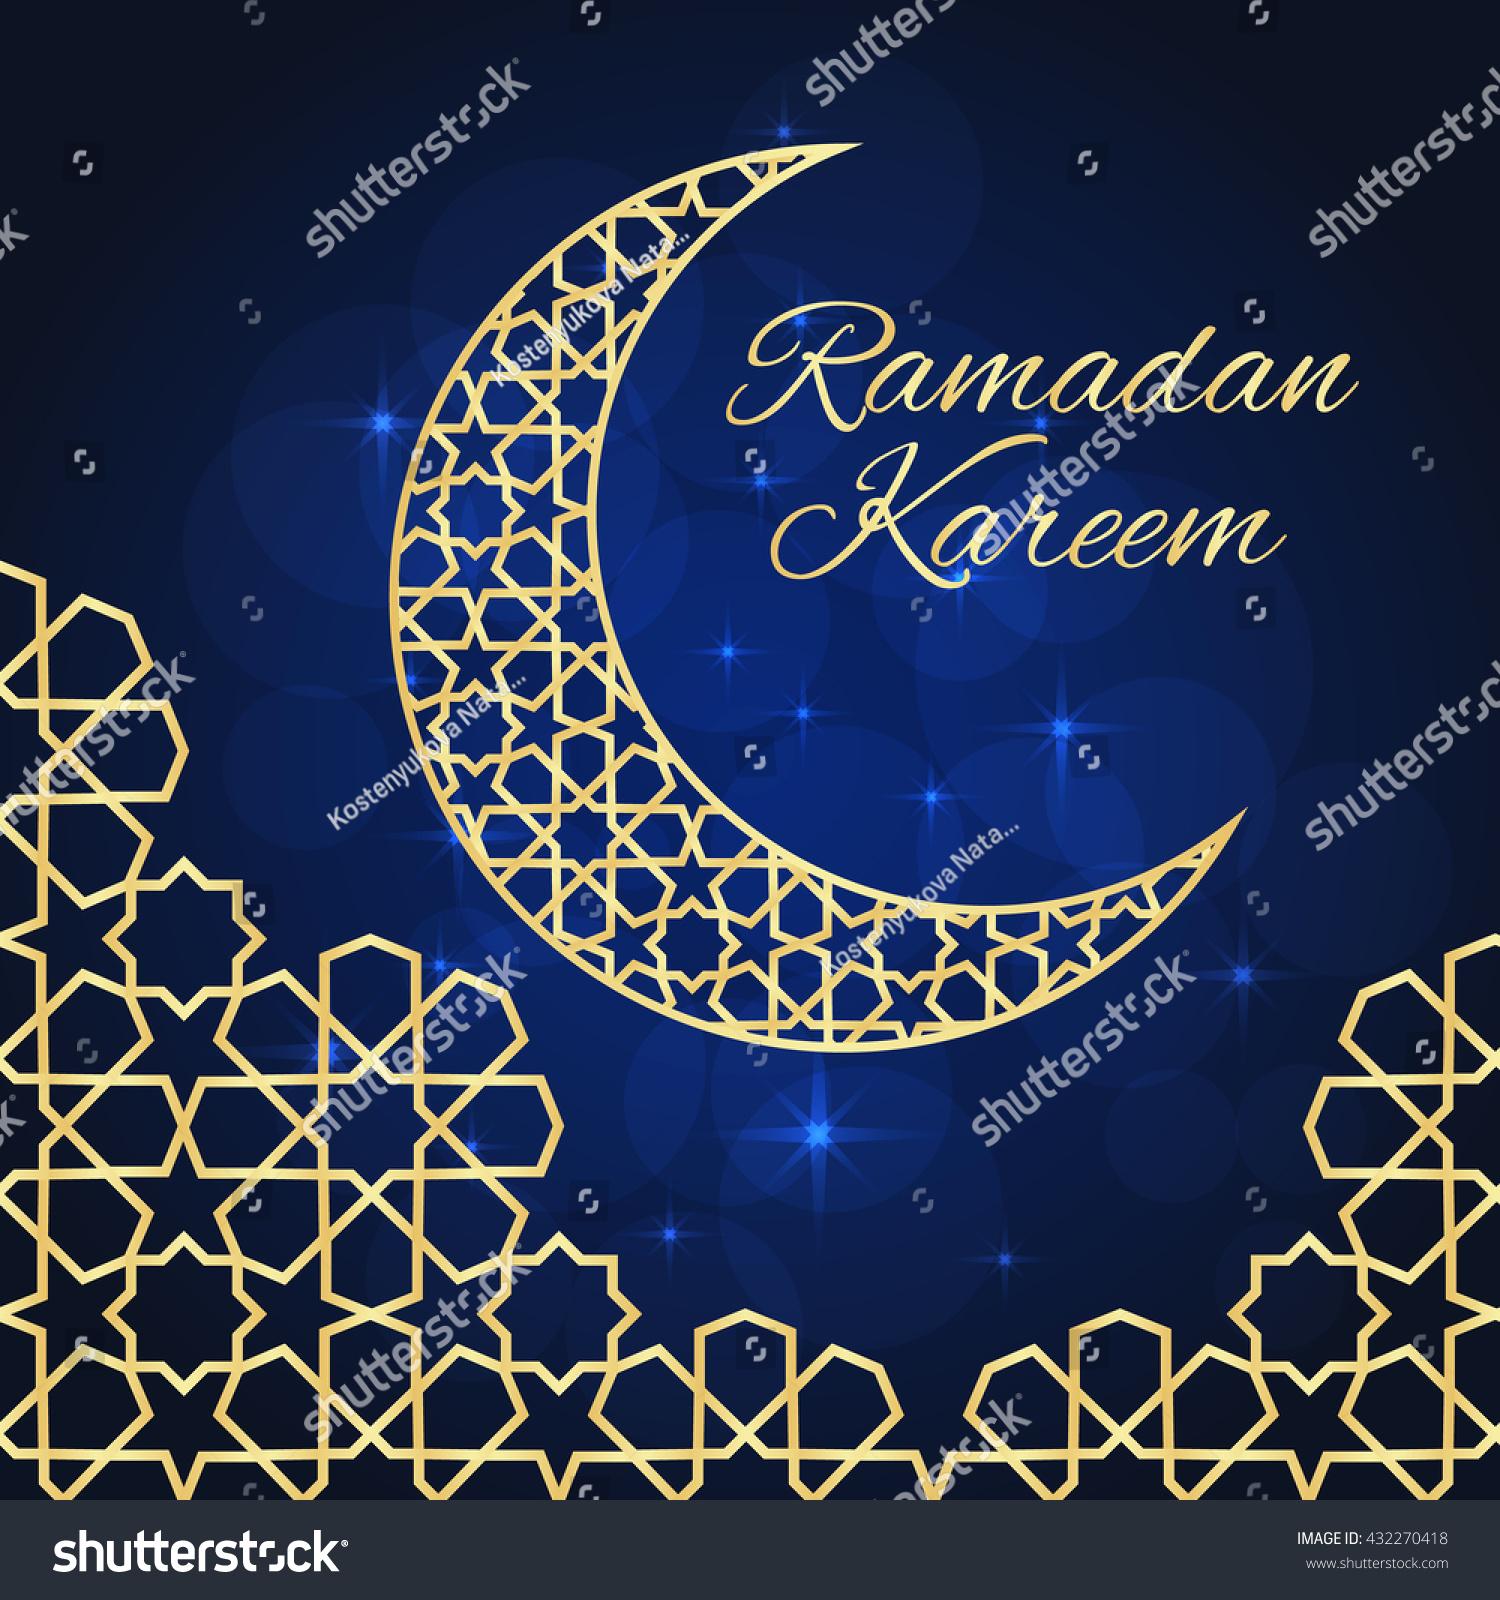 Ramadan greeting card on blue background stock illustration ramadan greeting card on blue background ramadan kareem means ramadan is generous kristyandbryce Image collections